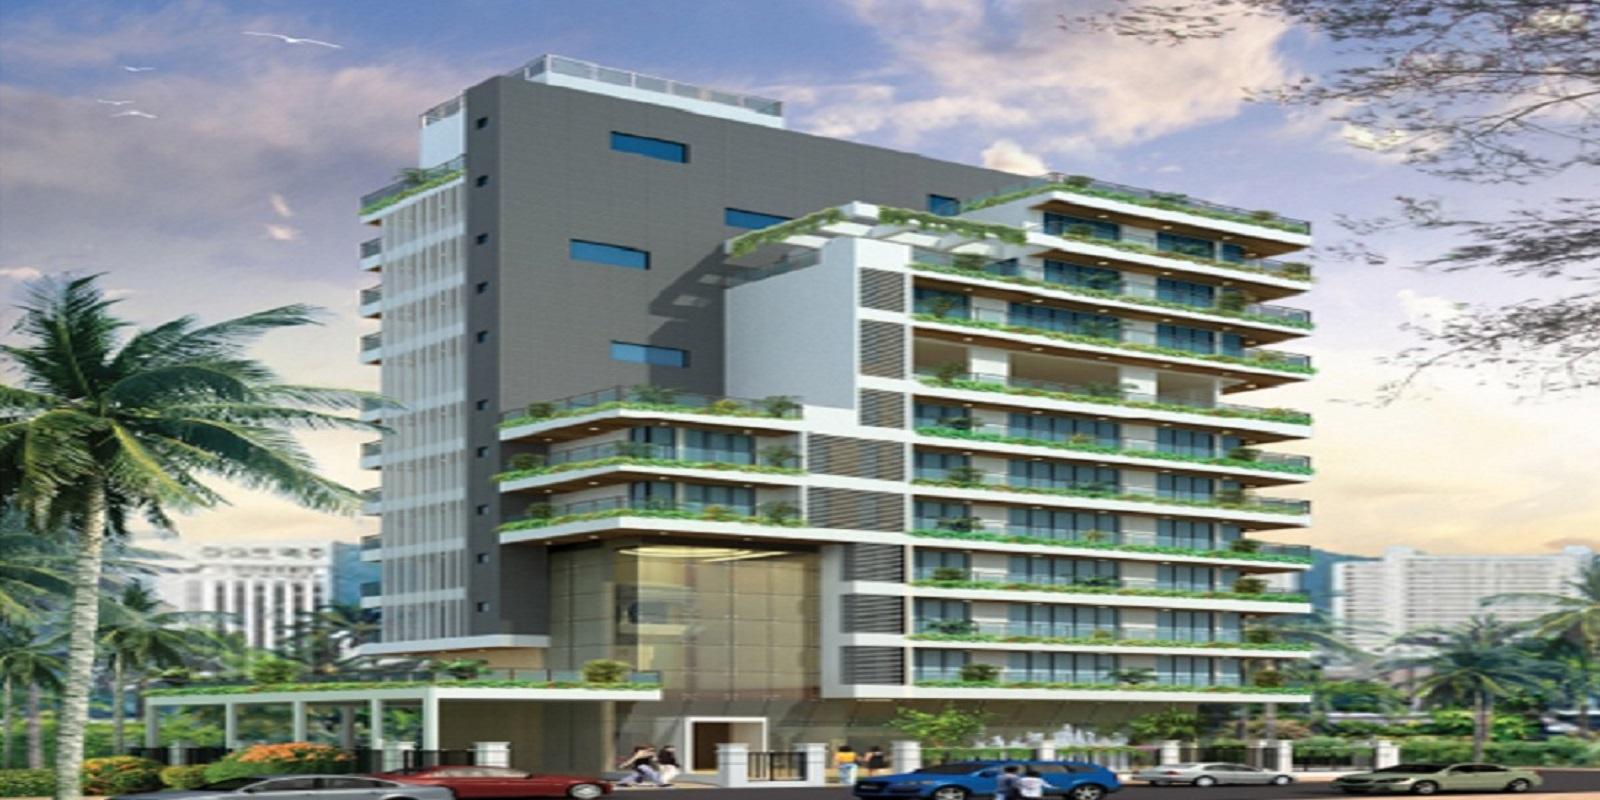 mayfair maaya project project large image1